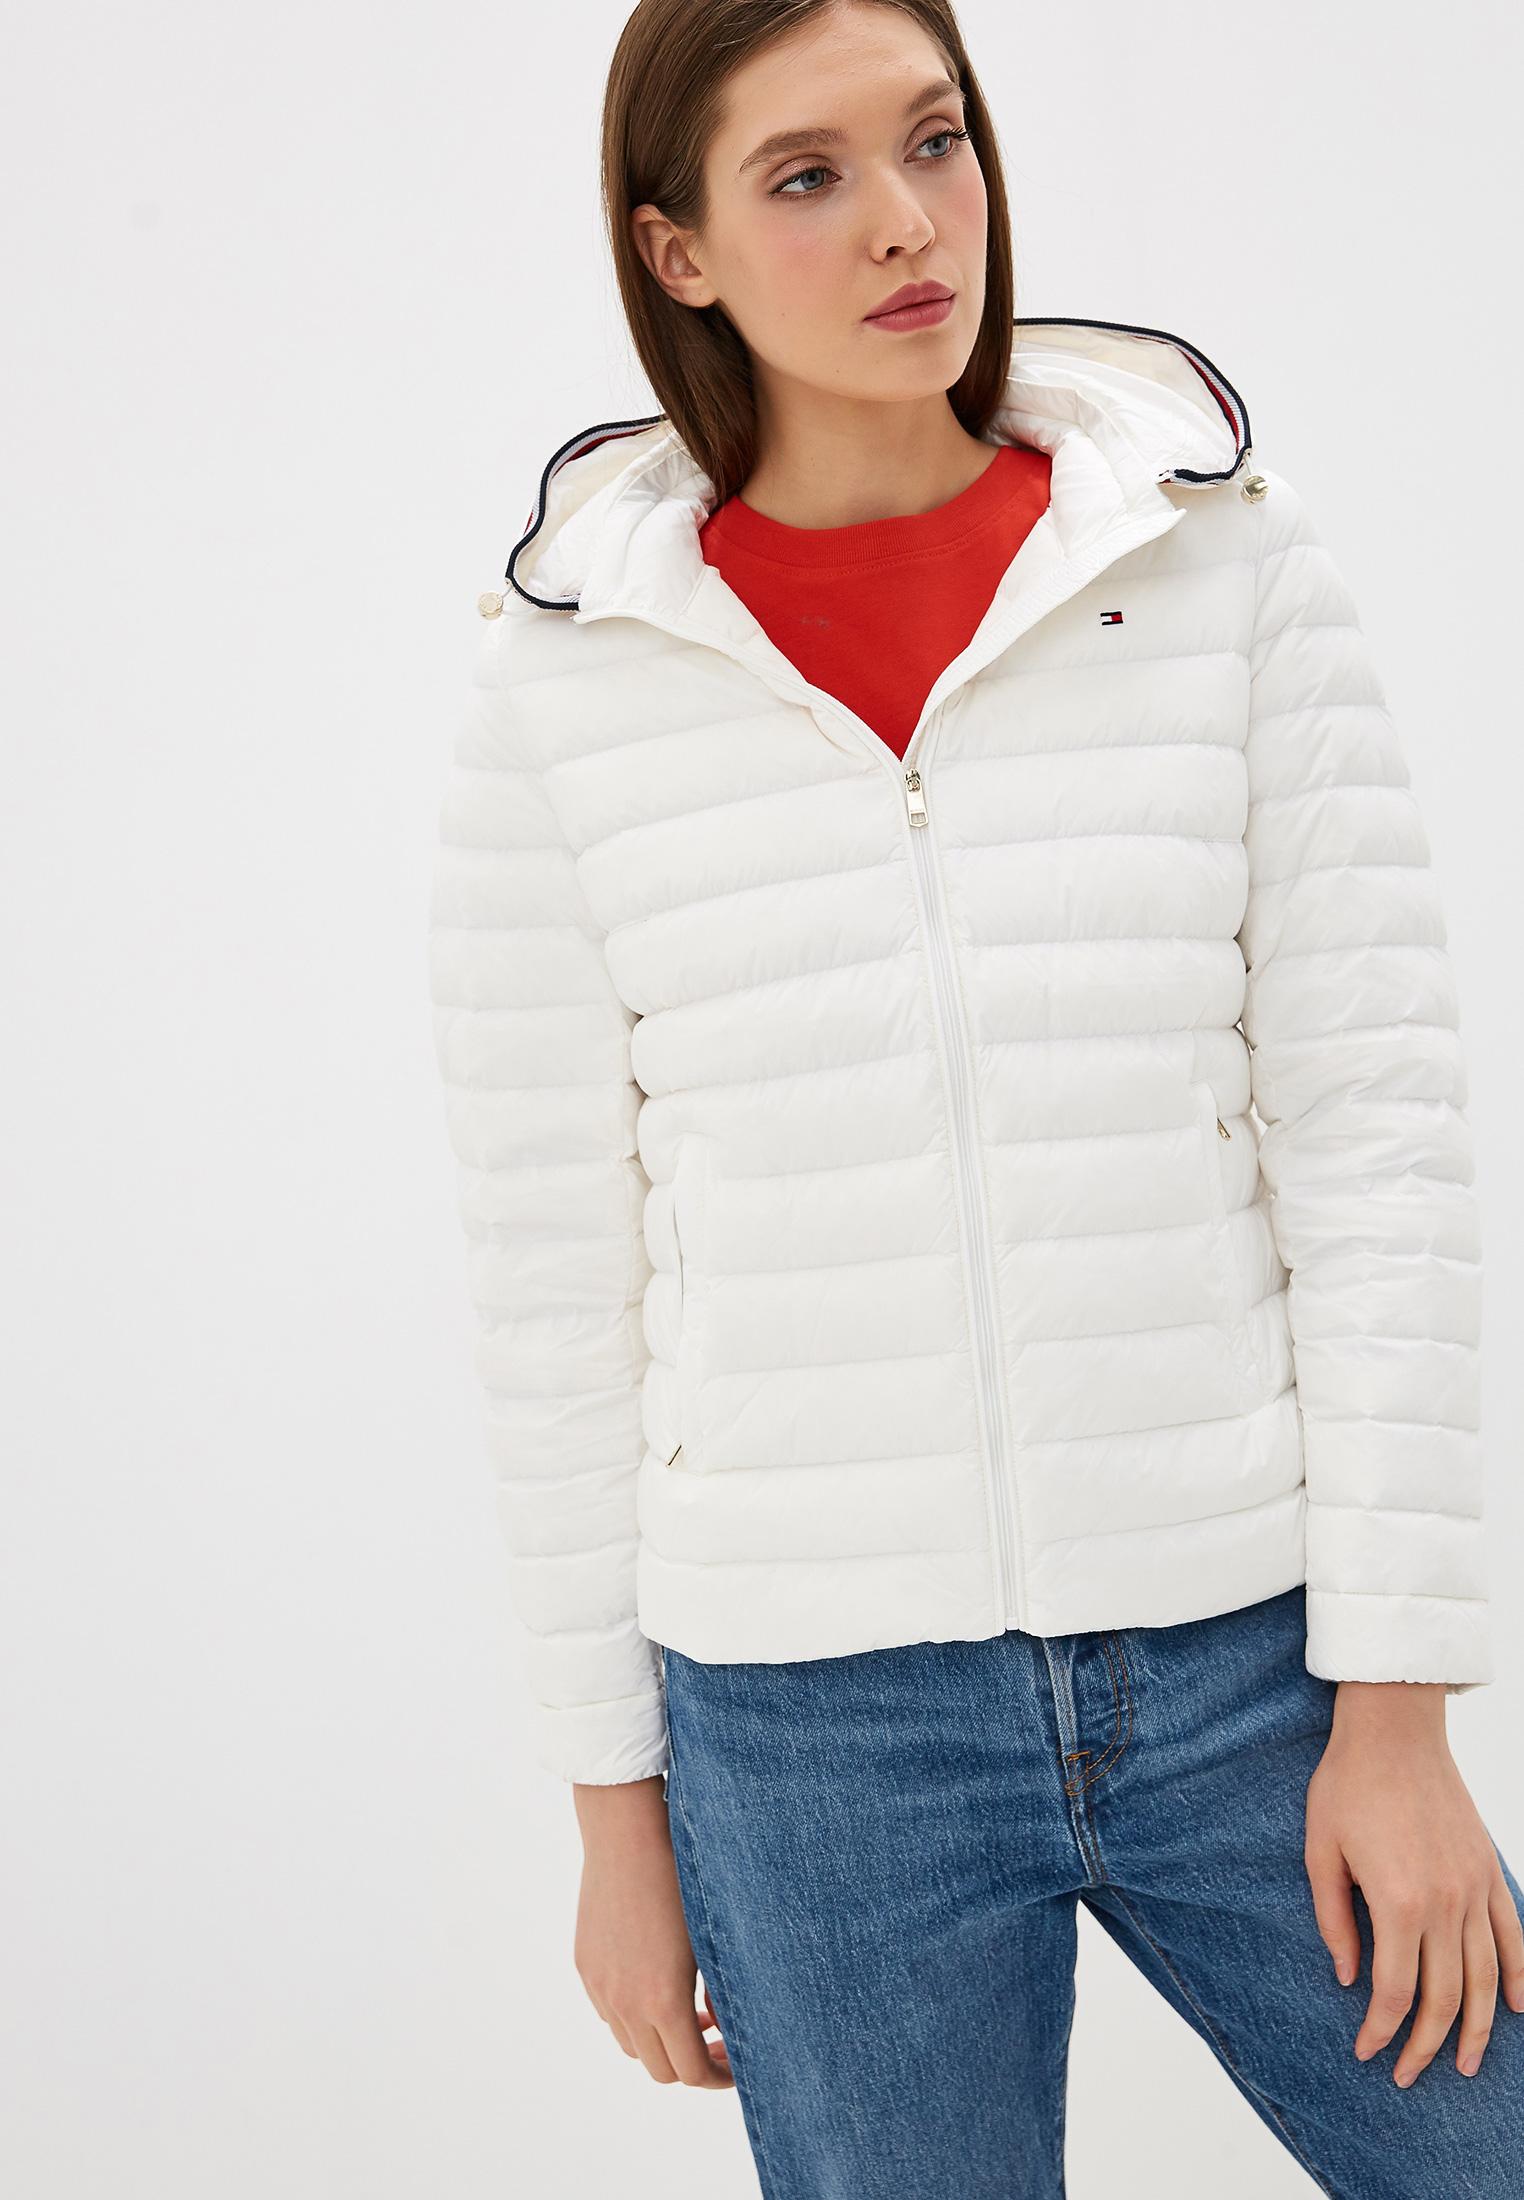 Утепленная куртка Tommy Hilfiger (Томми Хилфигер) WW0WW25155